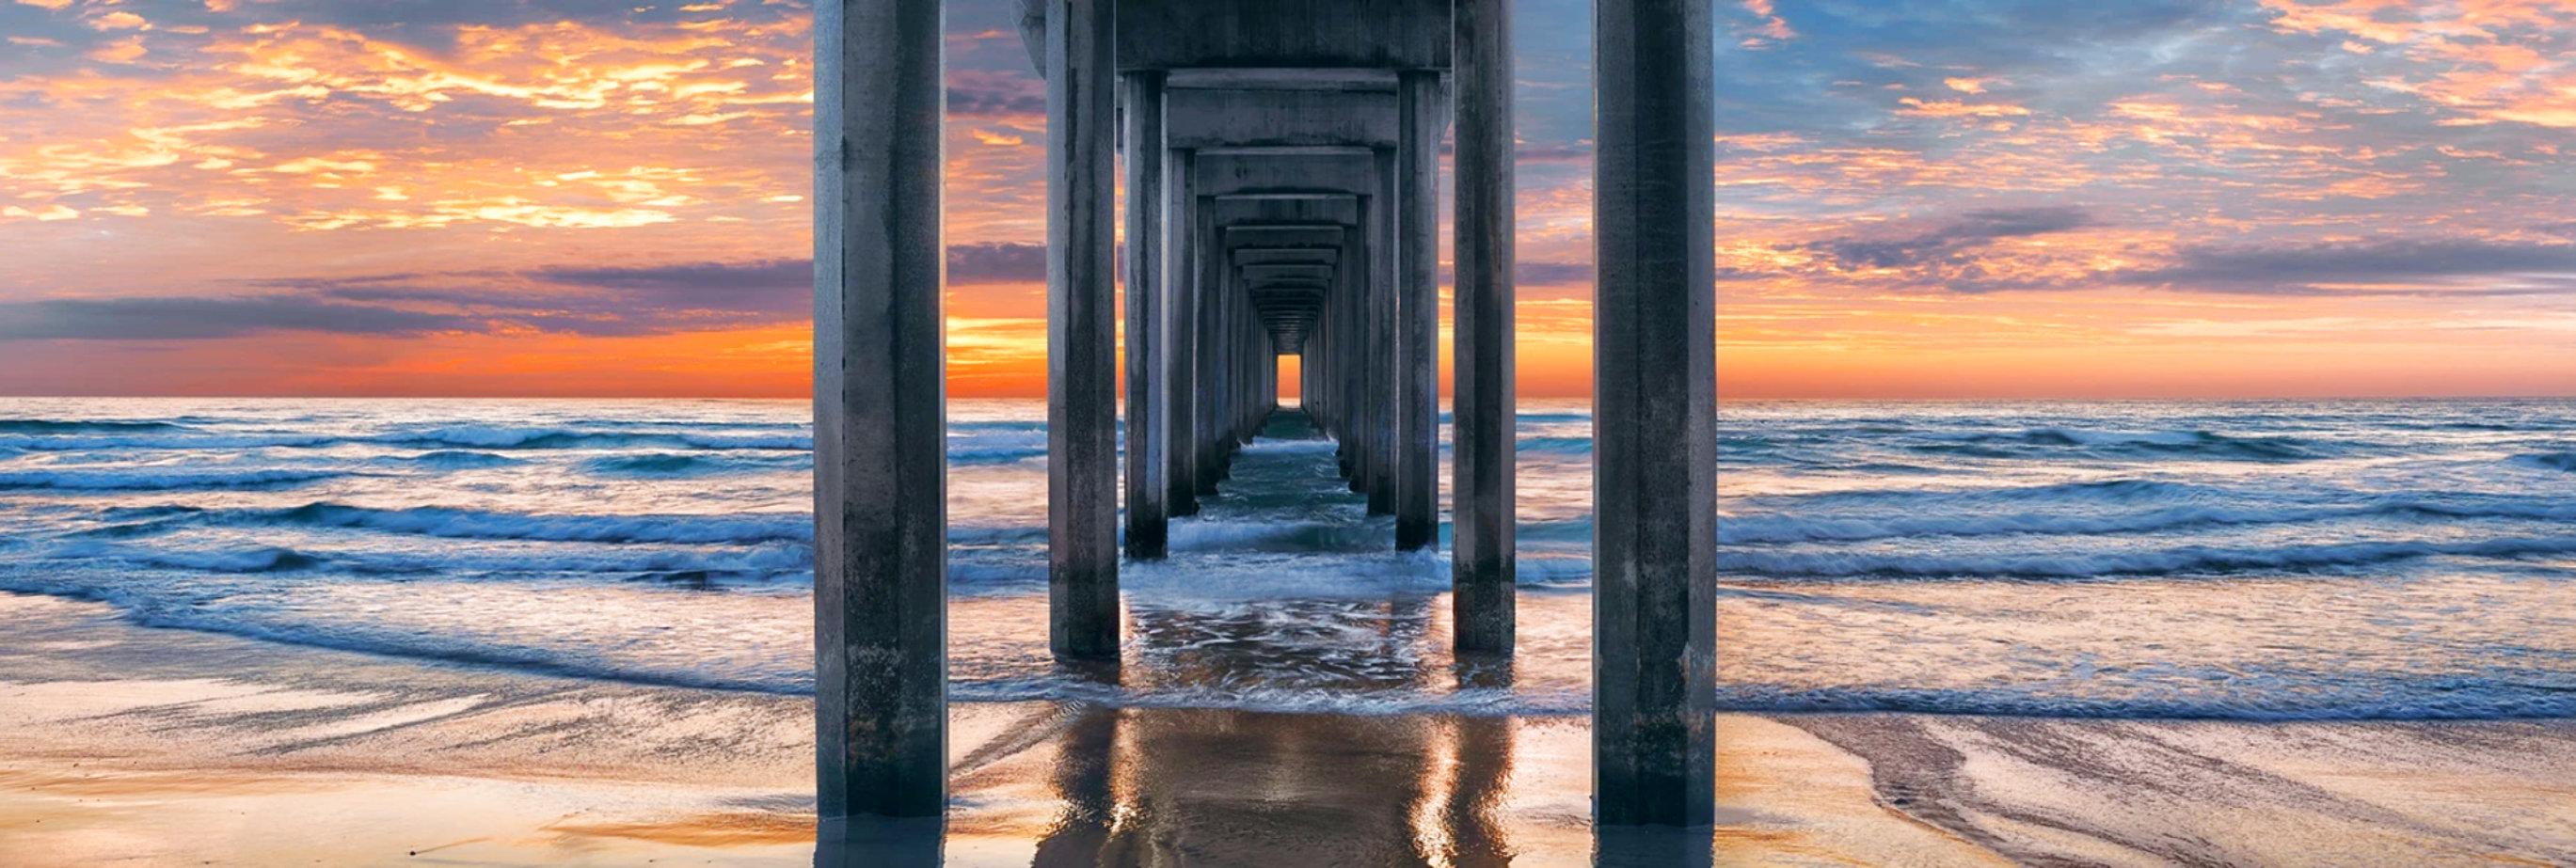 Coastal Dreams-1.5M Super Huge Panorama by Peter Lik